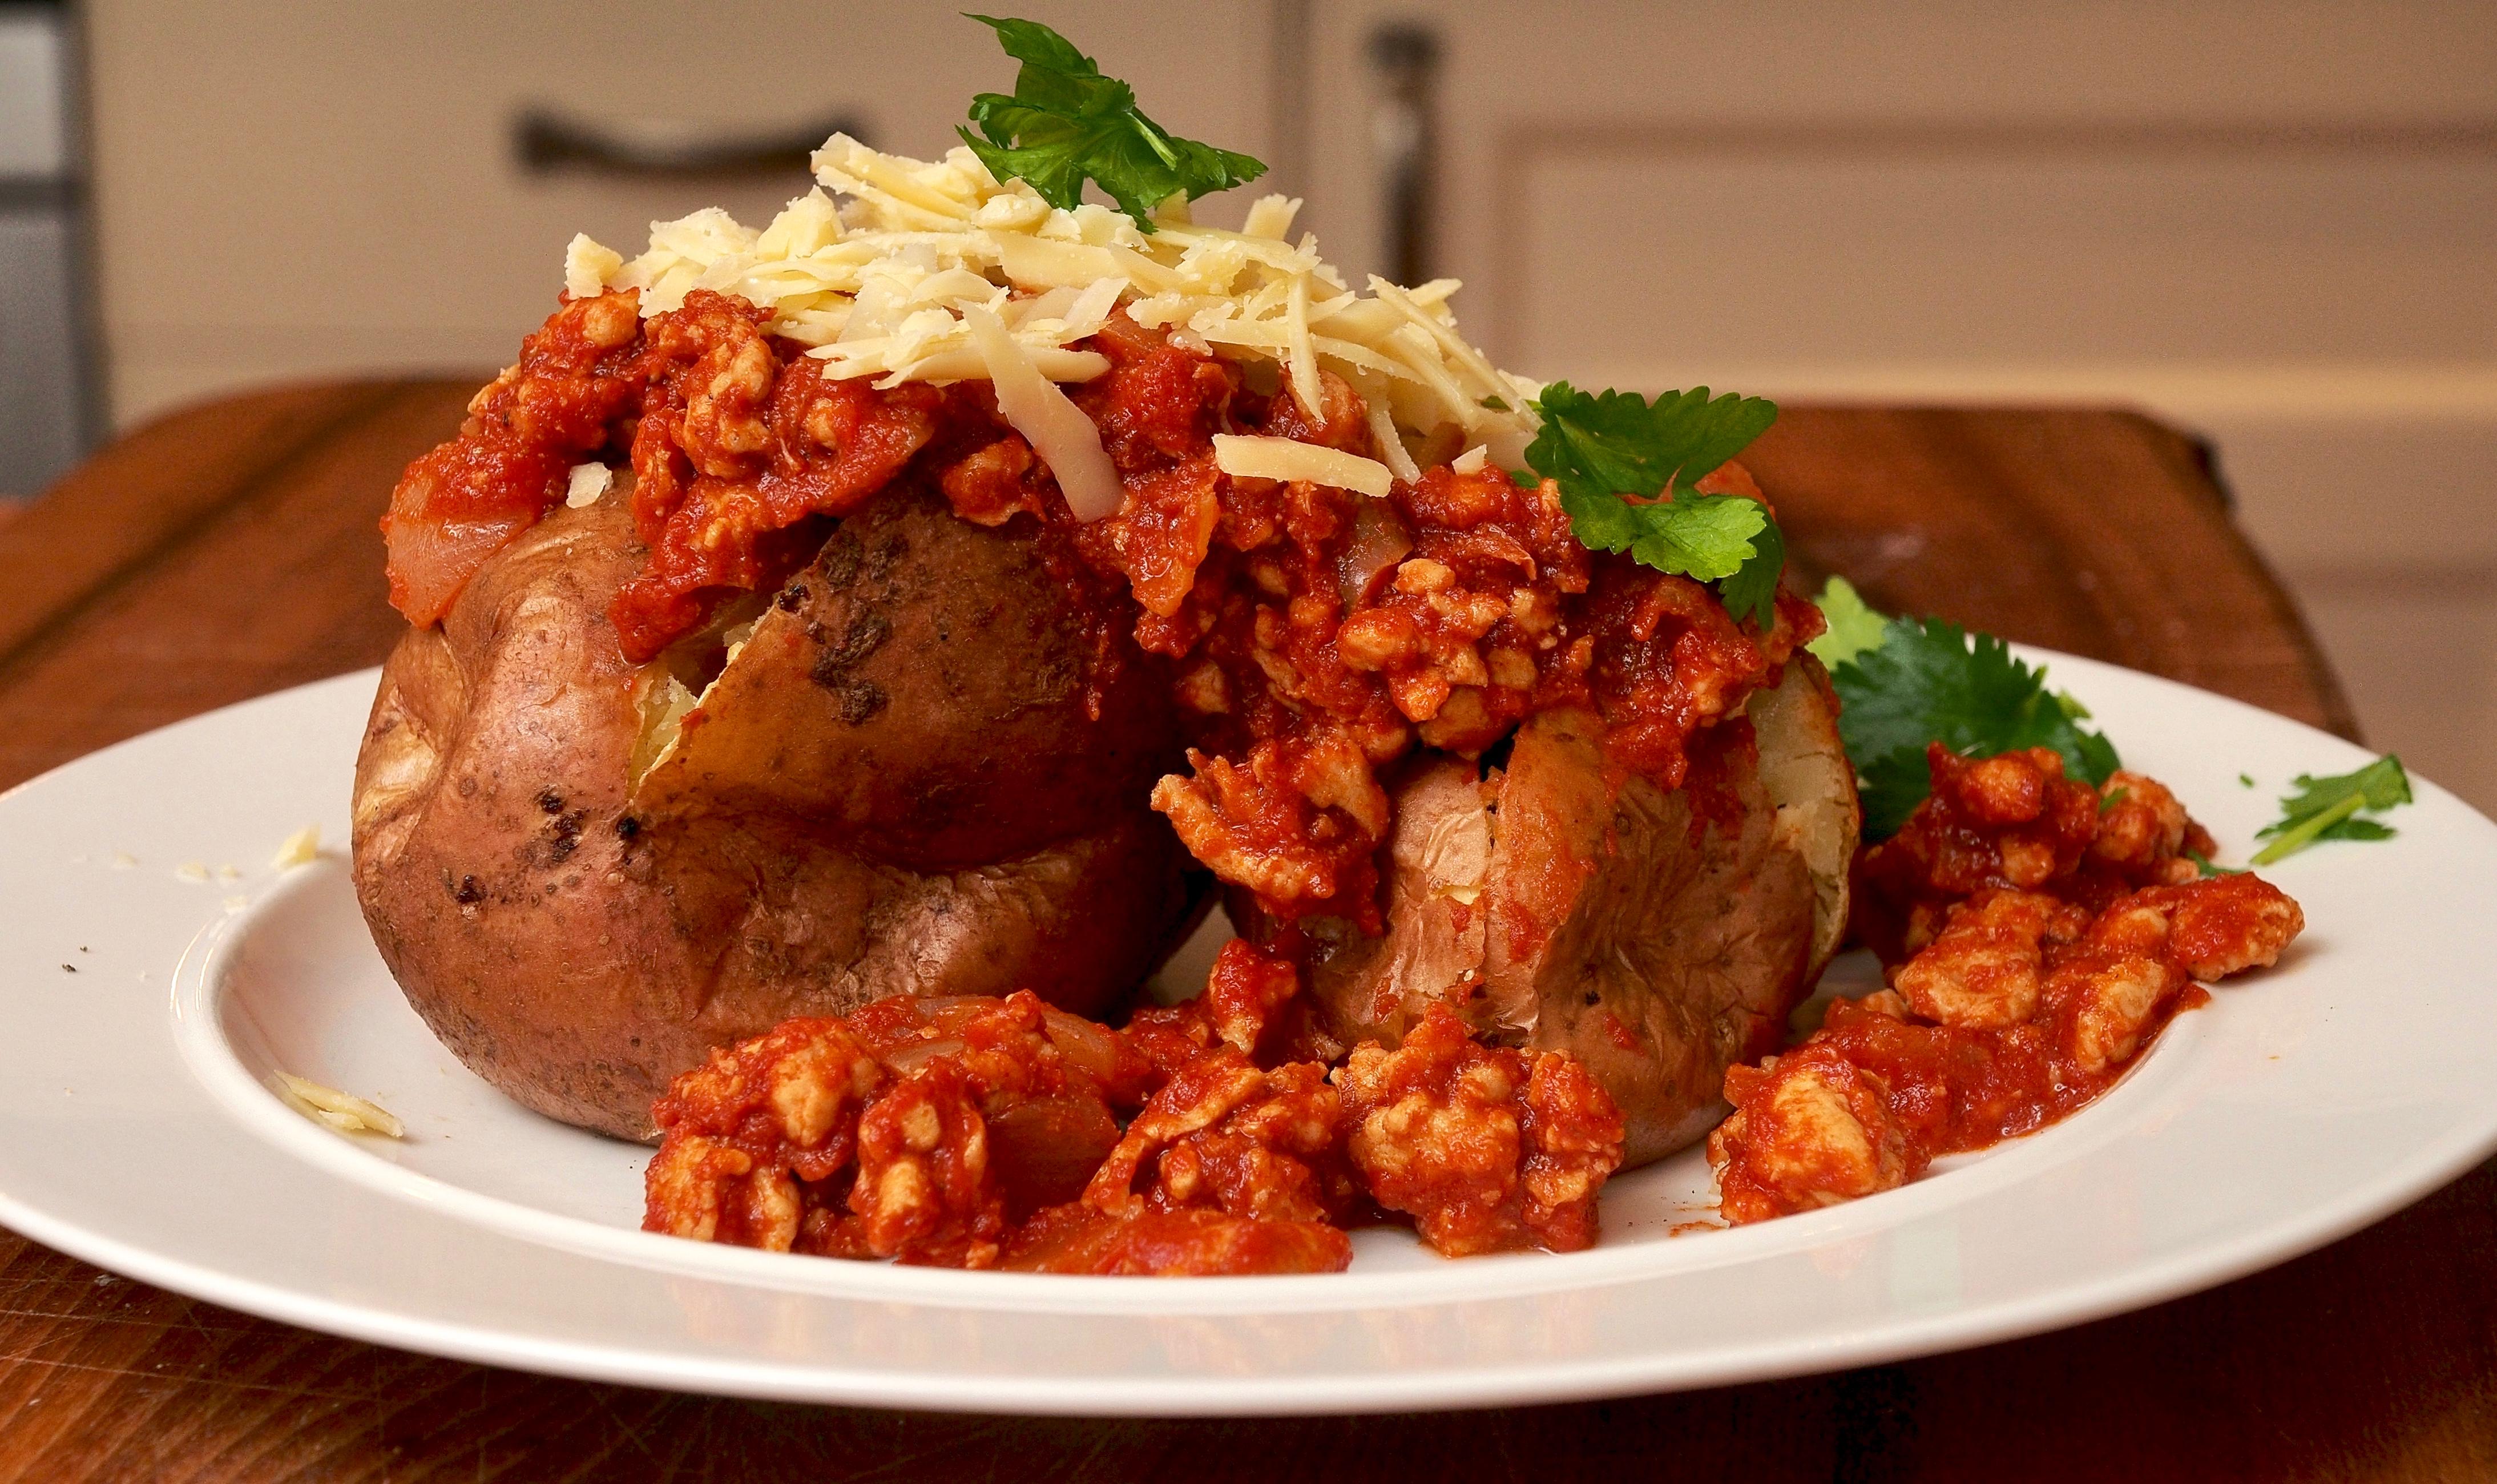 Turkey Chilli with jacket potatoes